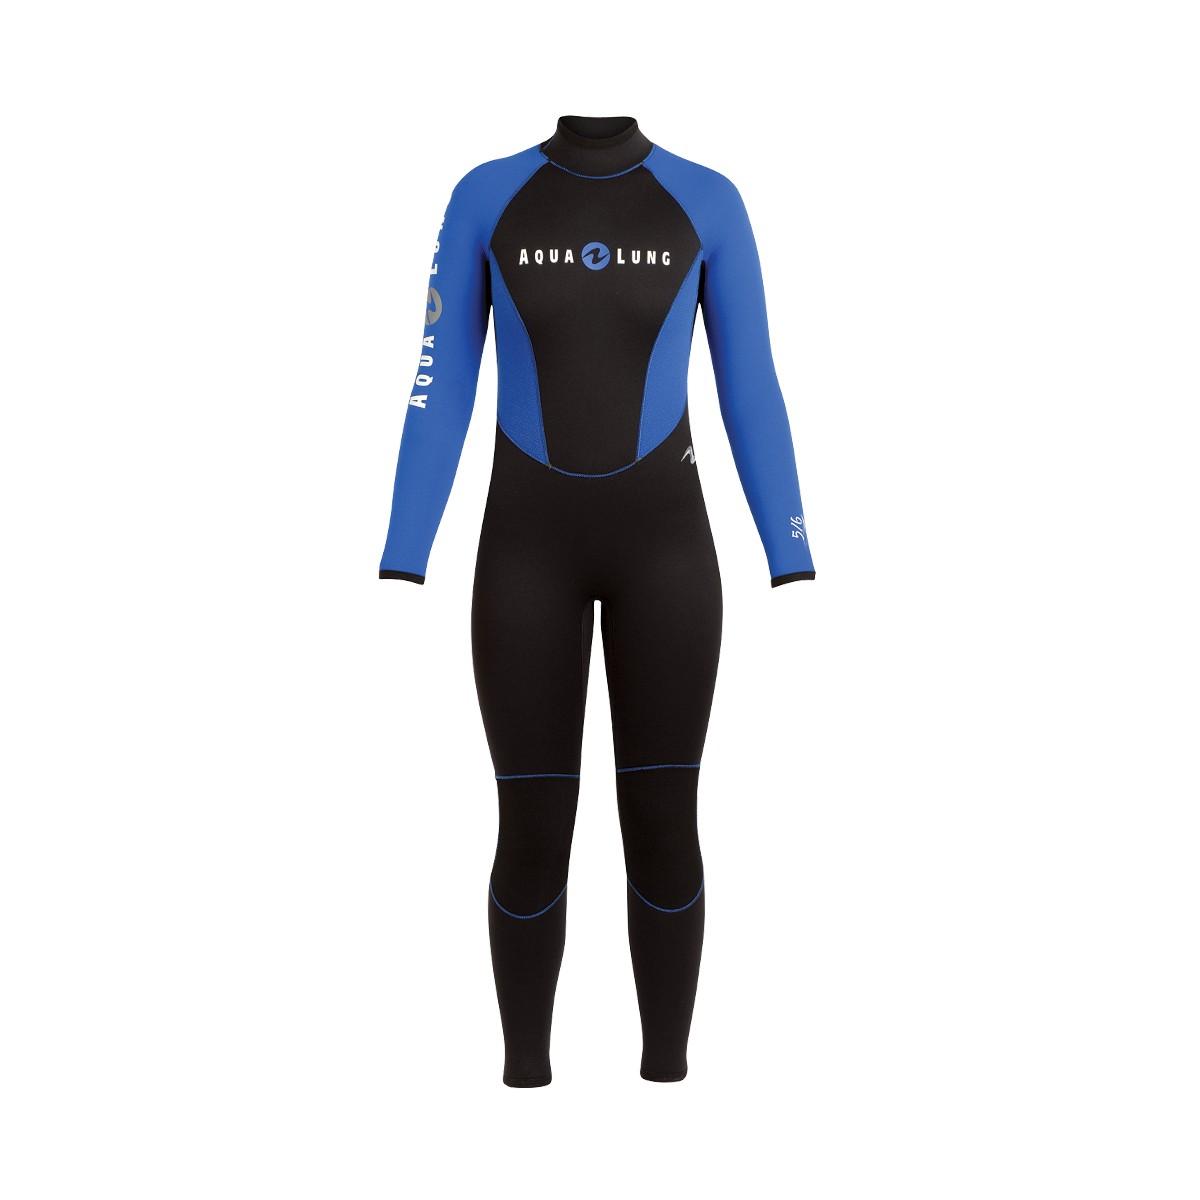 Aqua Lung Women's 7mm Rental Fullsuit